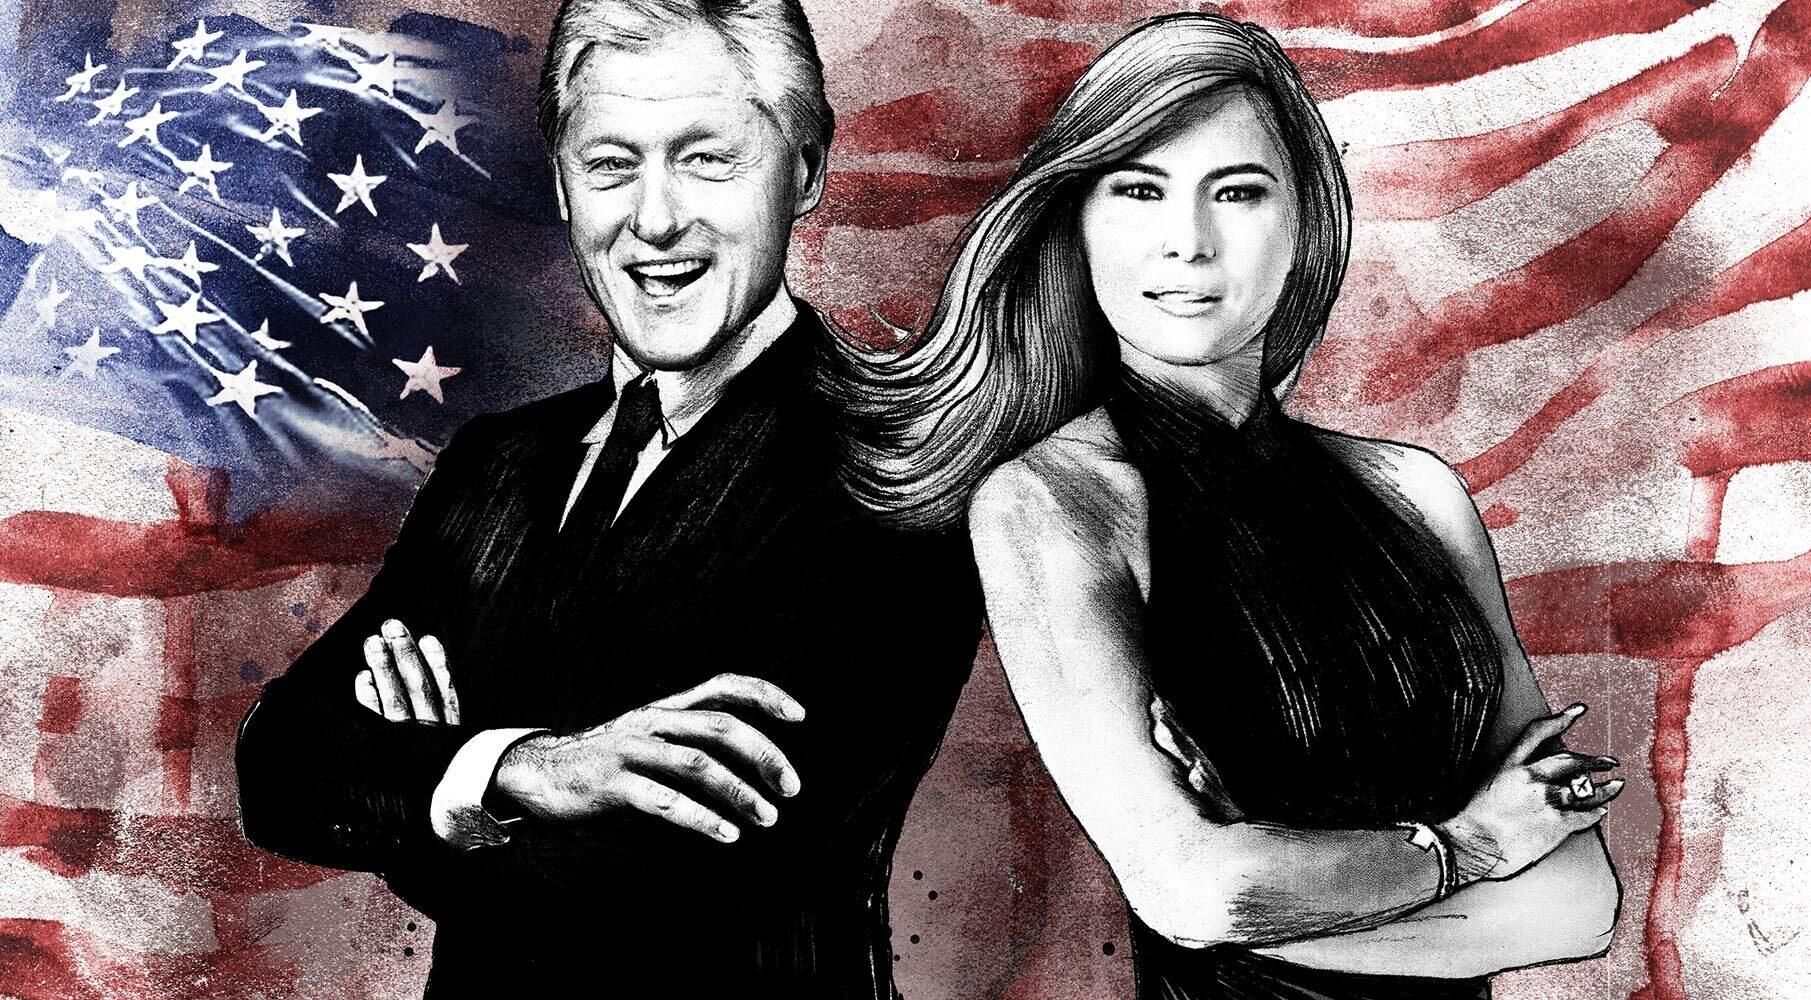 Melania Trump Bill Clinton portrait illustration usa partner - Kornel Illustration | Kornel Stadler portfolio